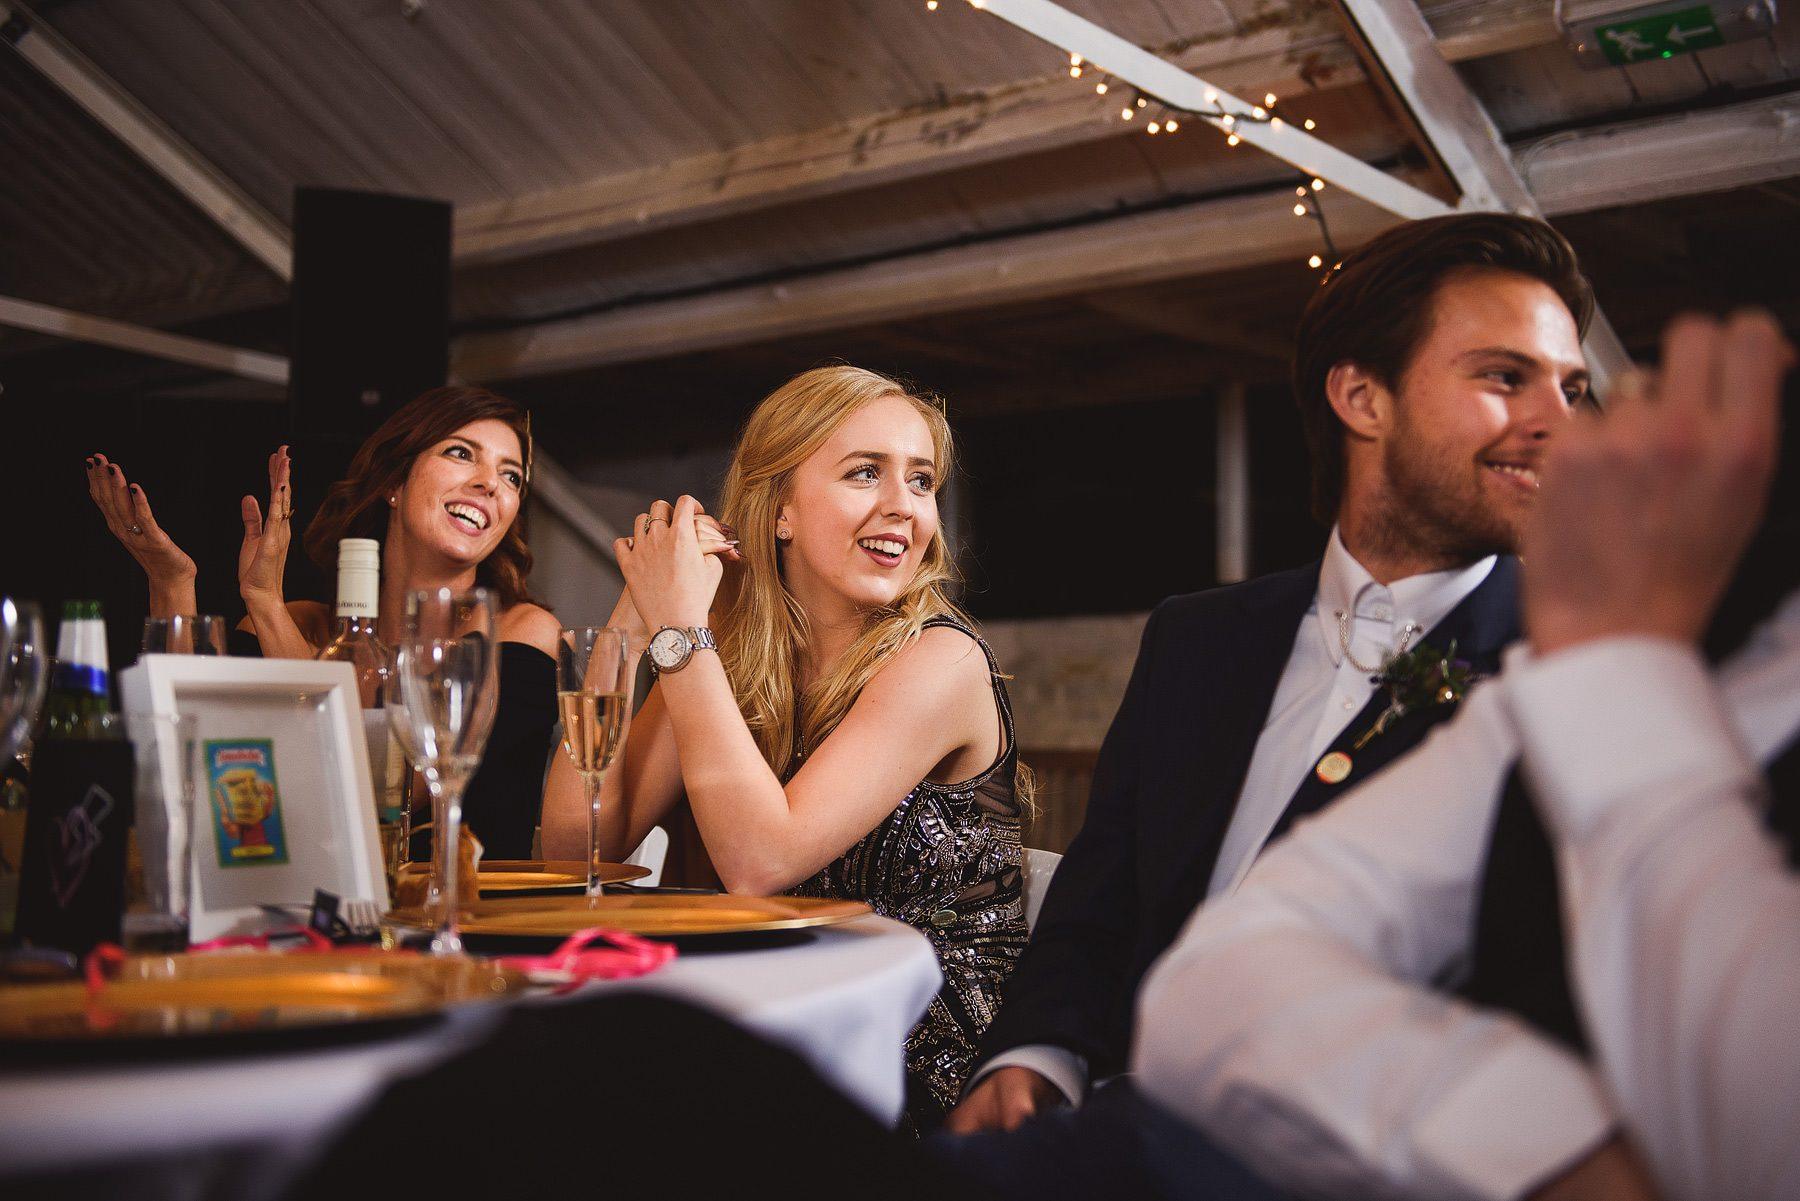 dalston heights weddings